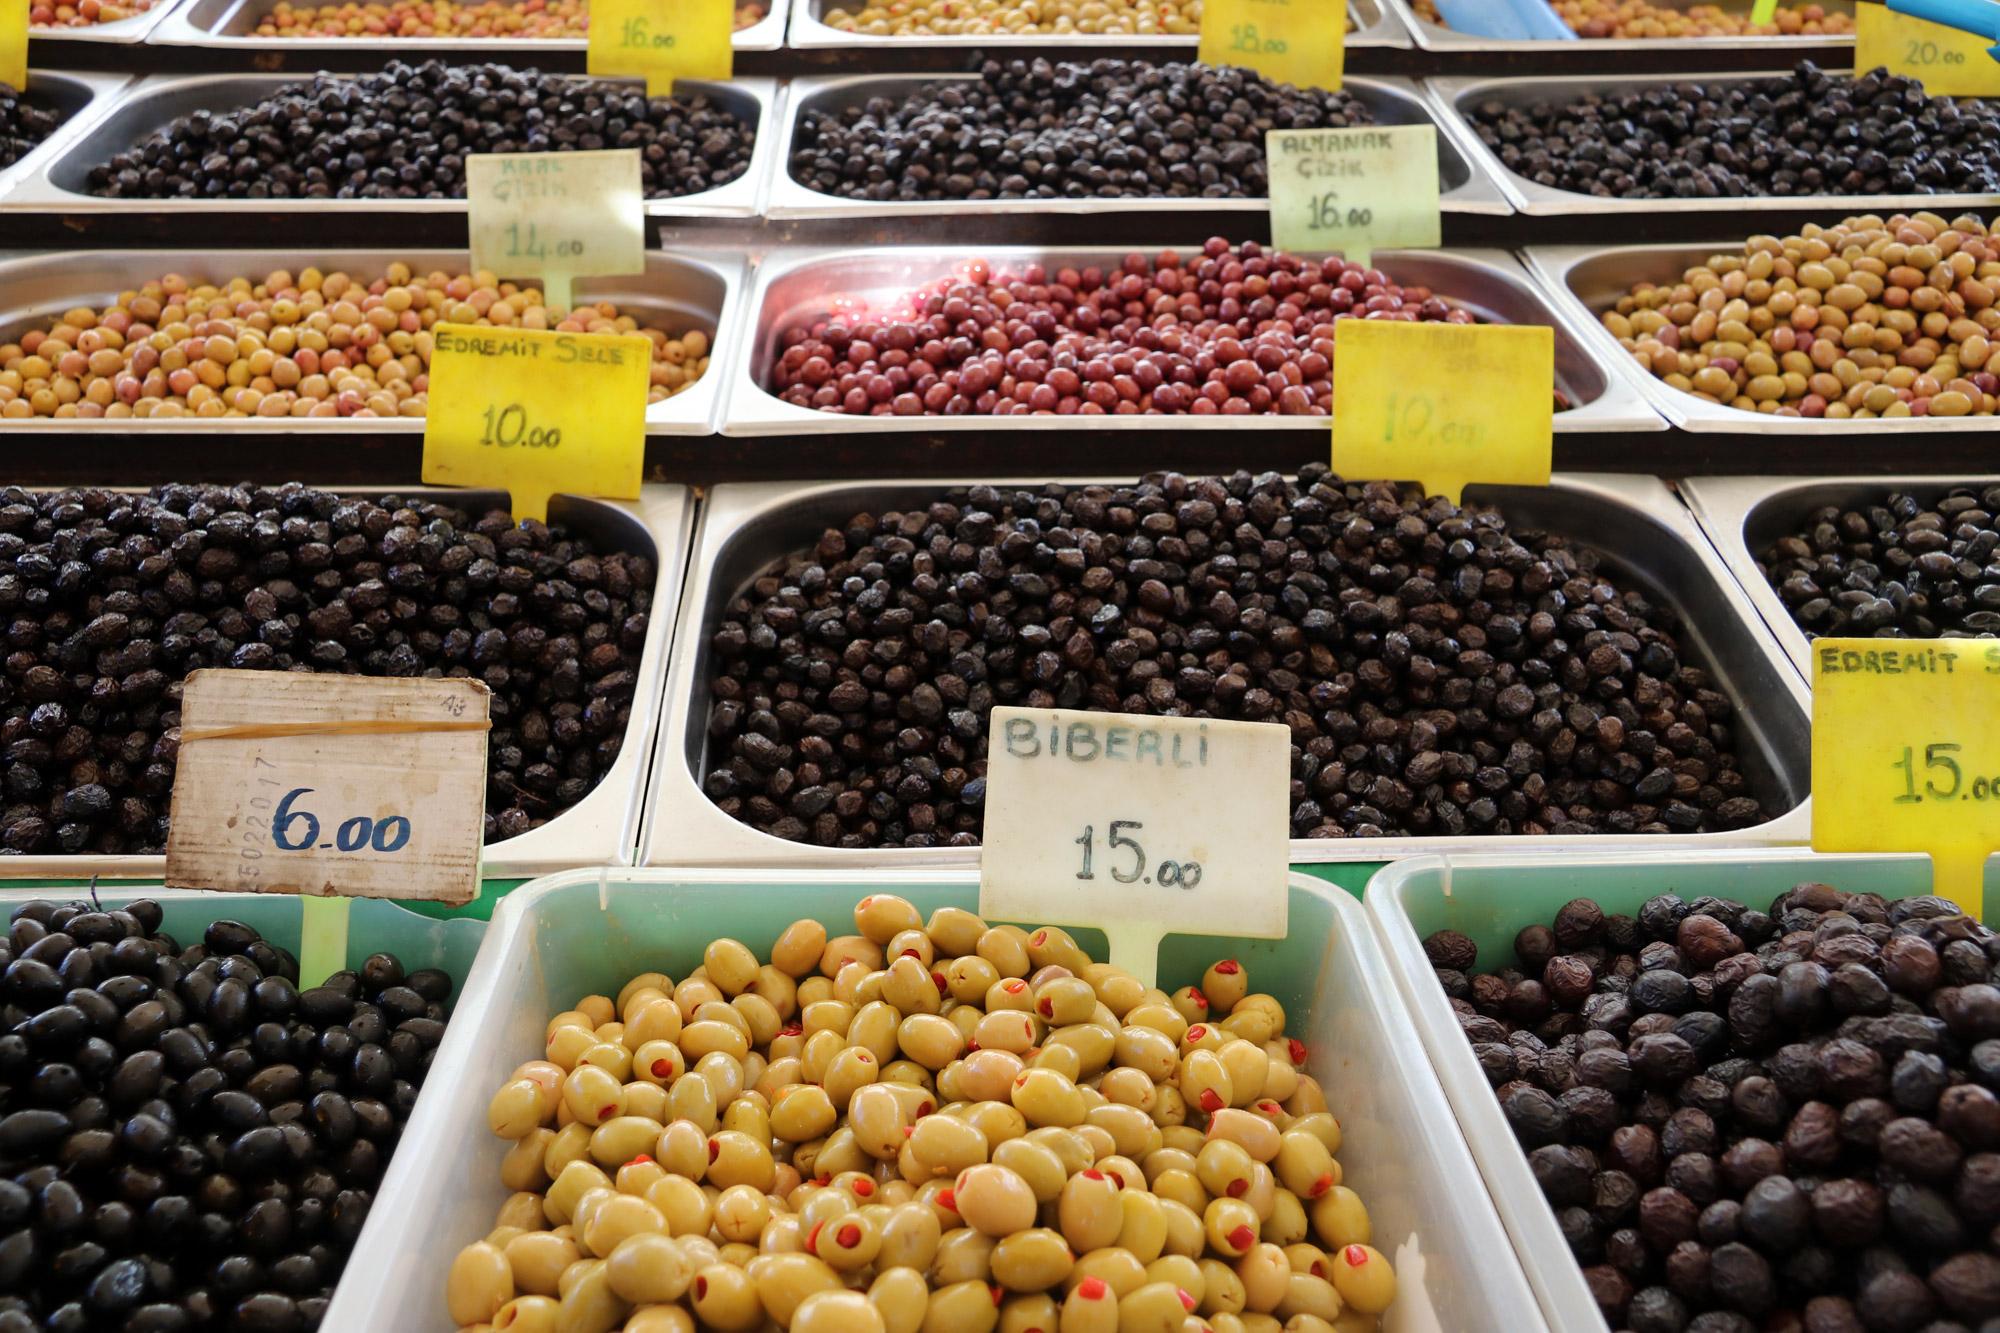 Turkije reisverslag: Laatste dag in Alaçatı - Olijven op de markt van Alaçatı